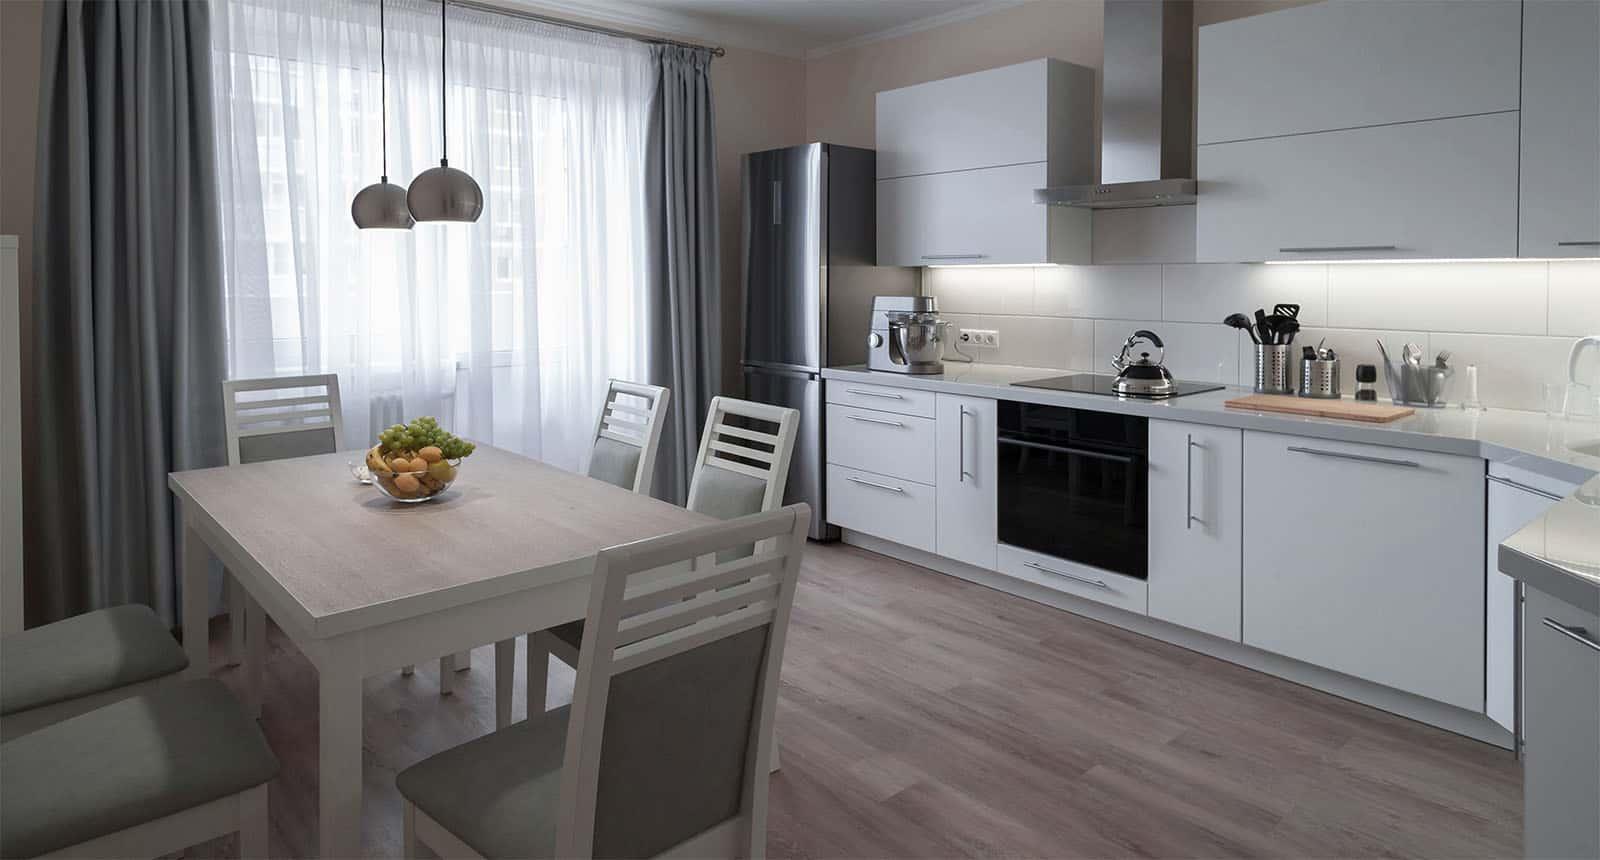 Interior Apartment kitchen